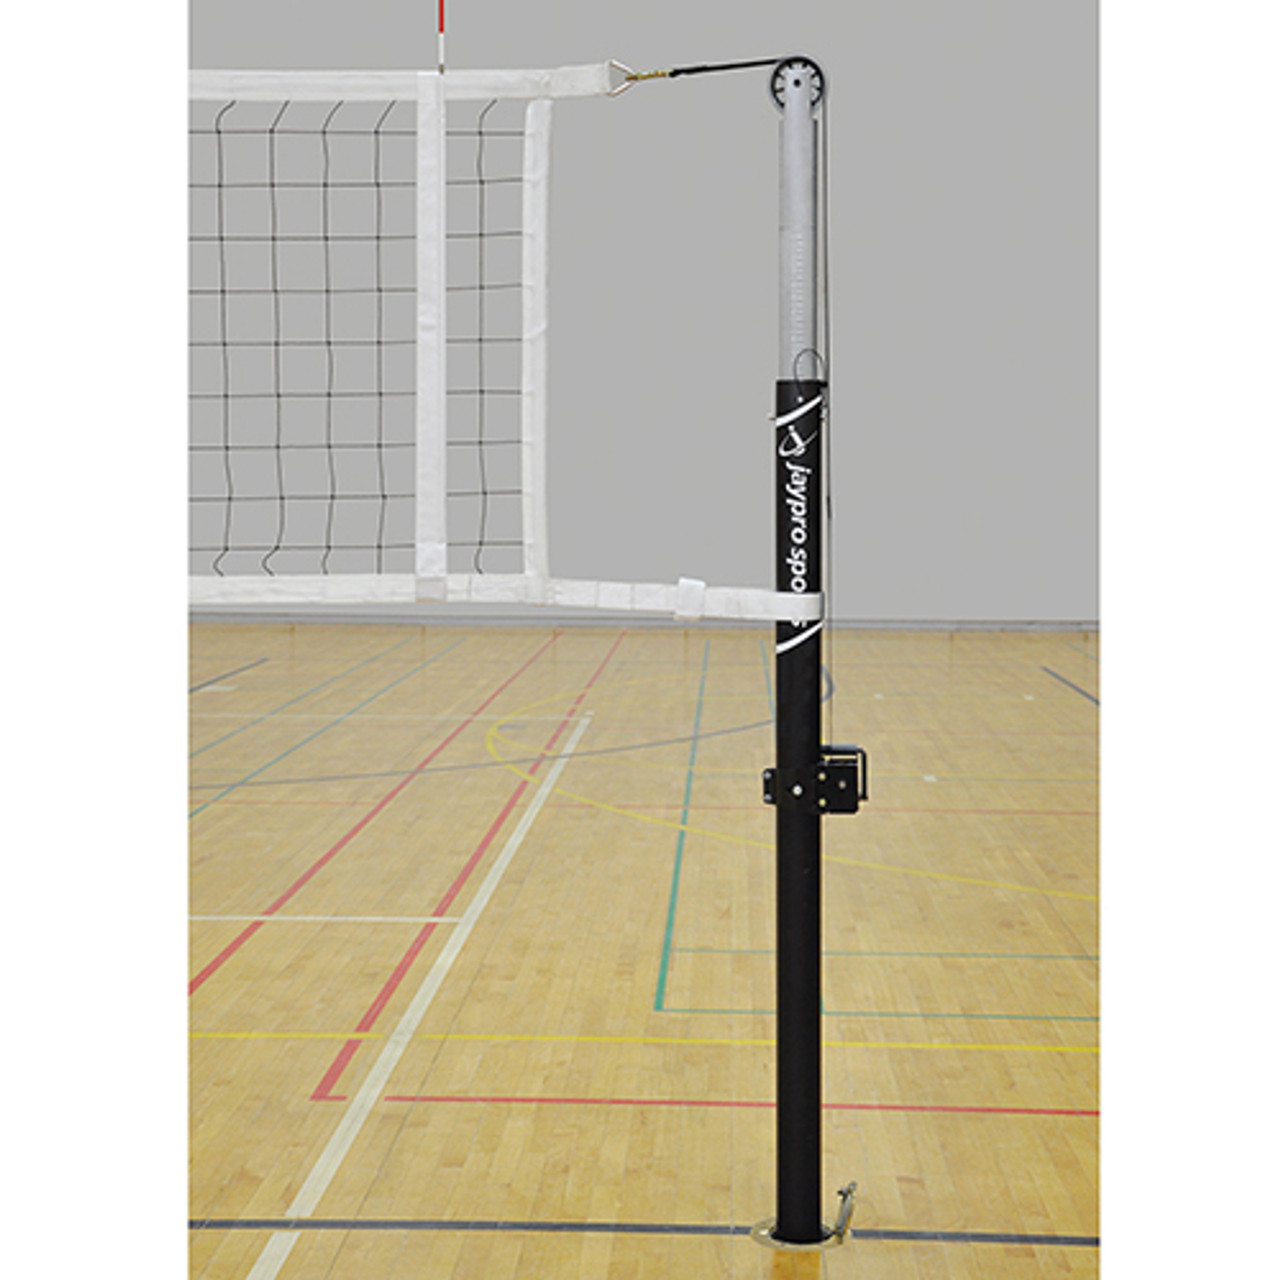 Featherlite Volleyball System